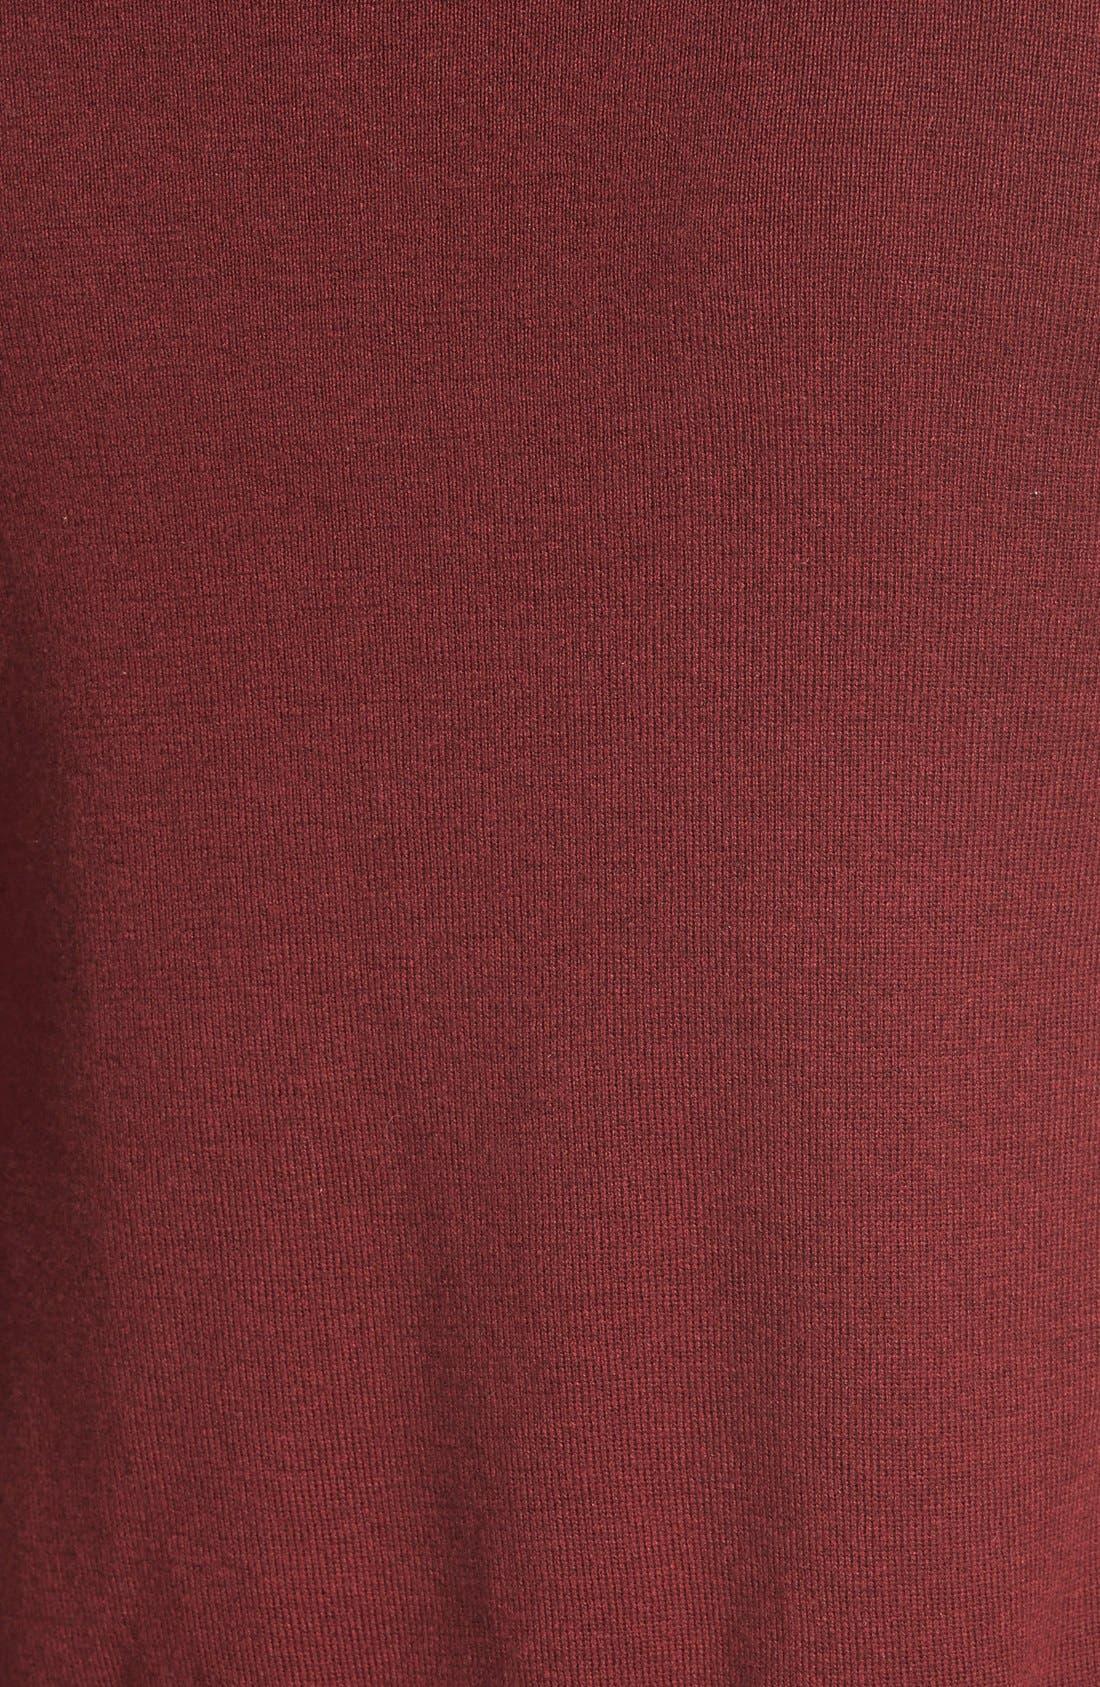 4-Way Convertible Lightweight Cardigan,                             Alternate thumbnail 409, color,